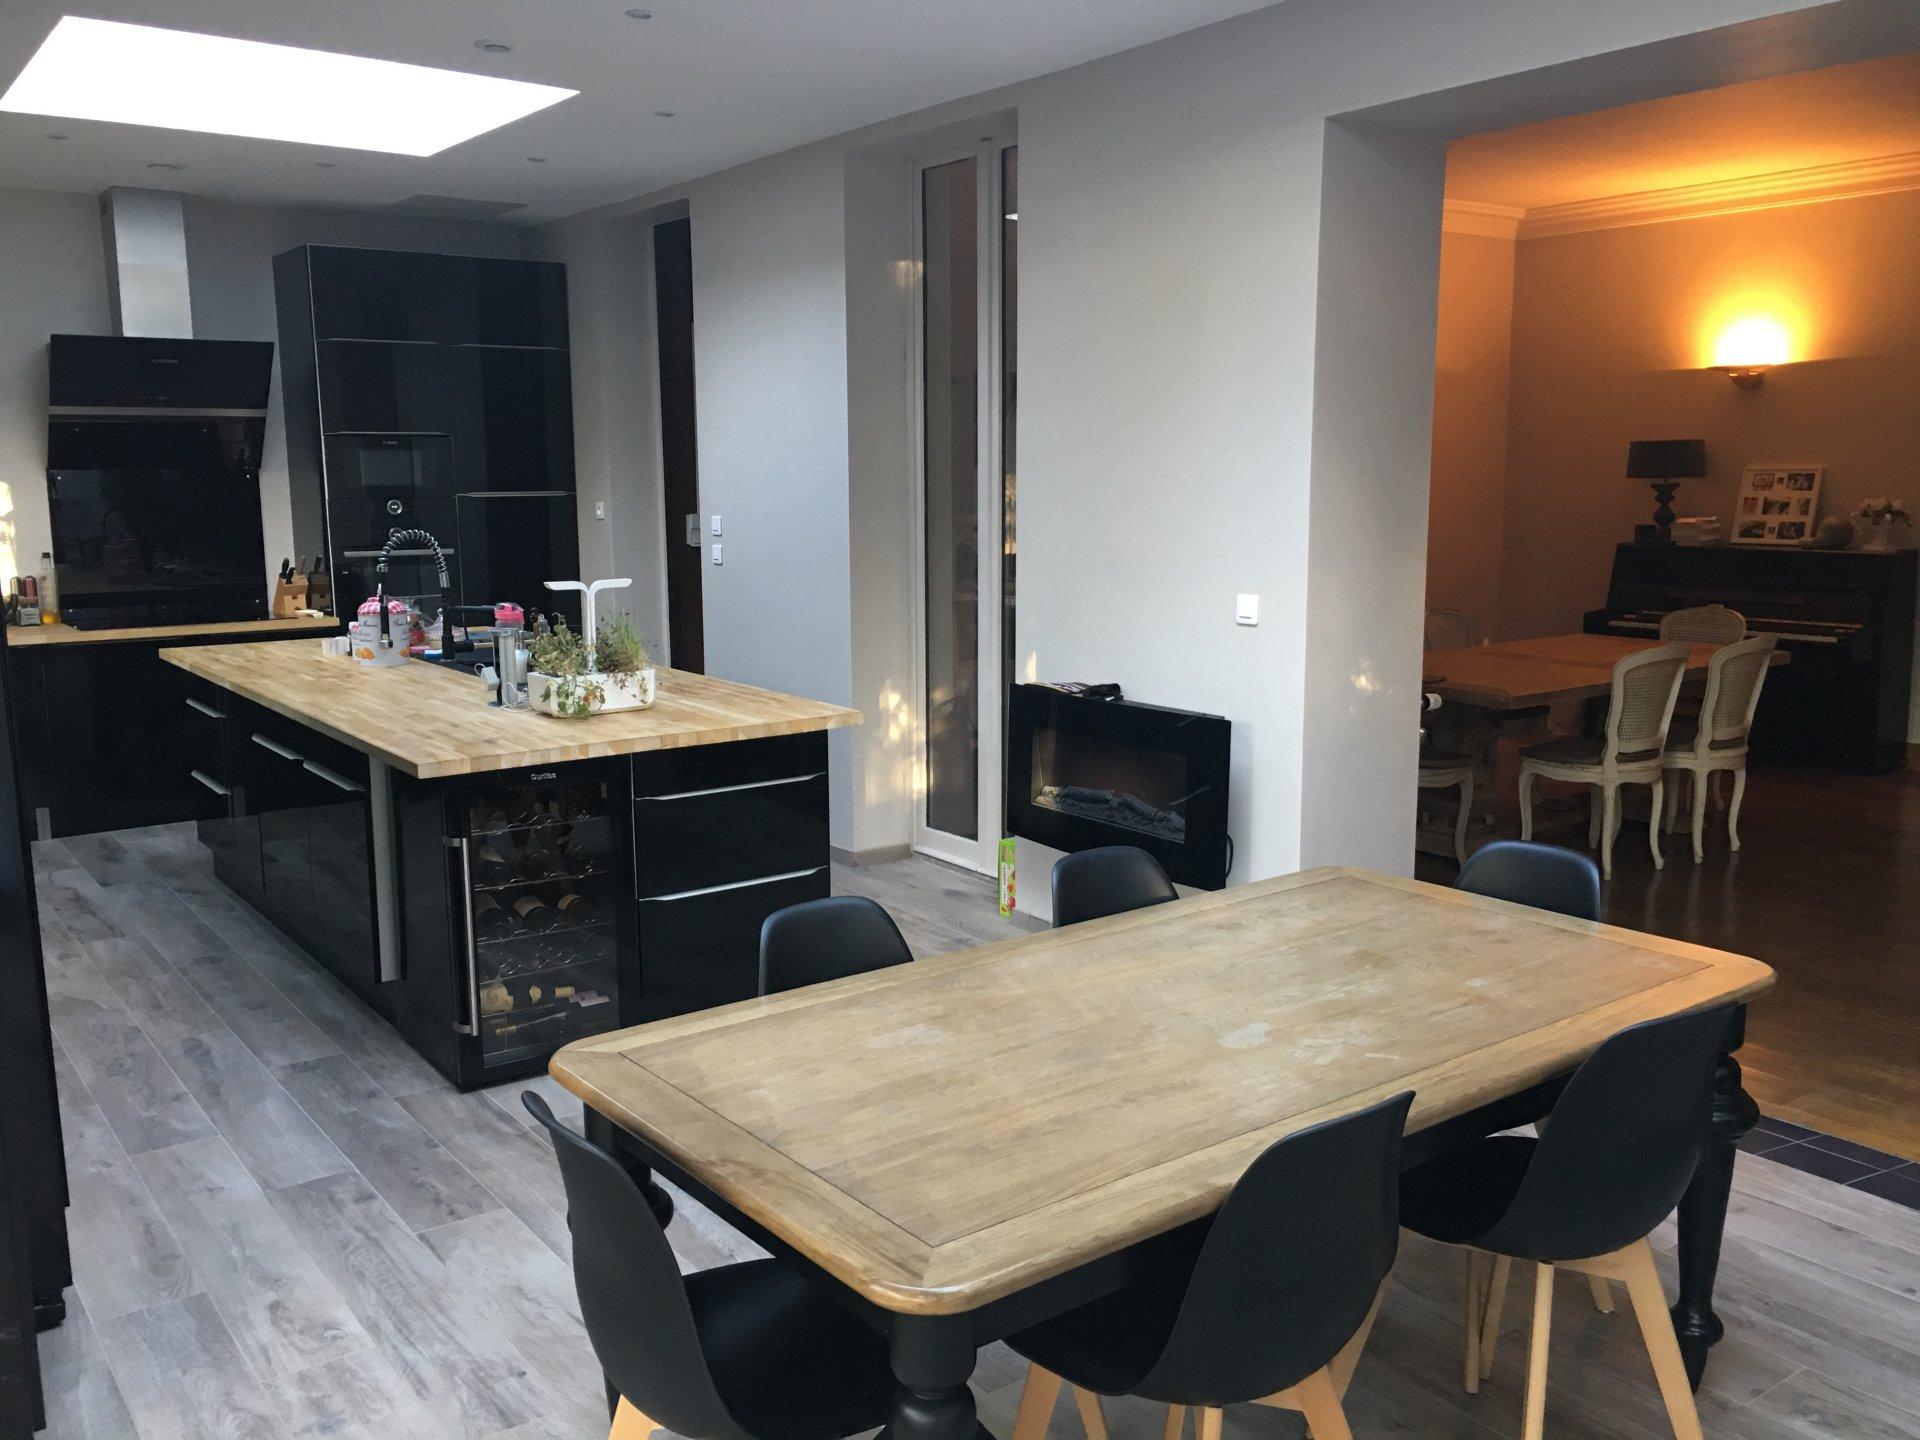 Kitchen island, skylight, kitchen bar